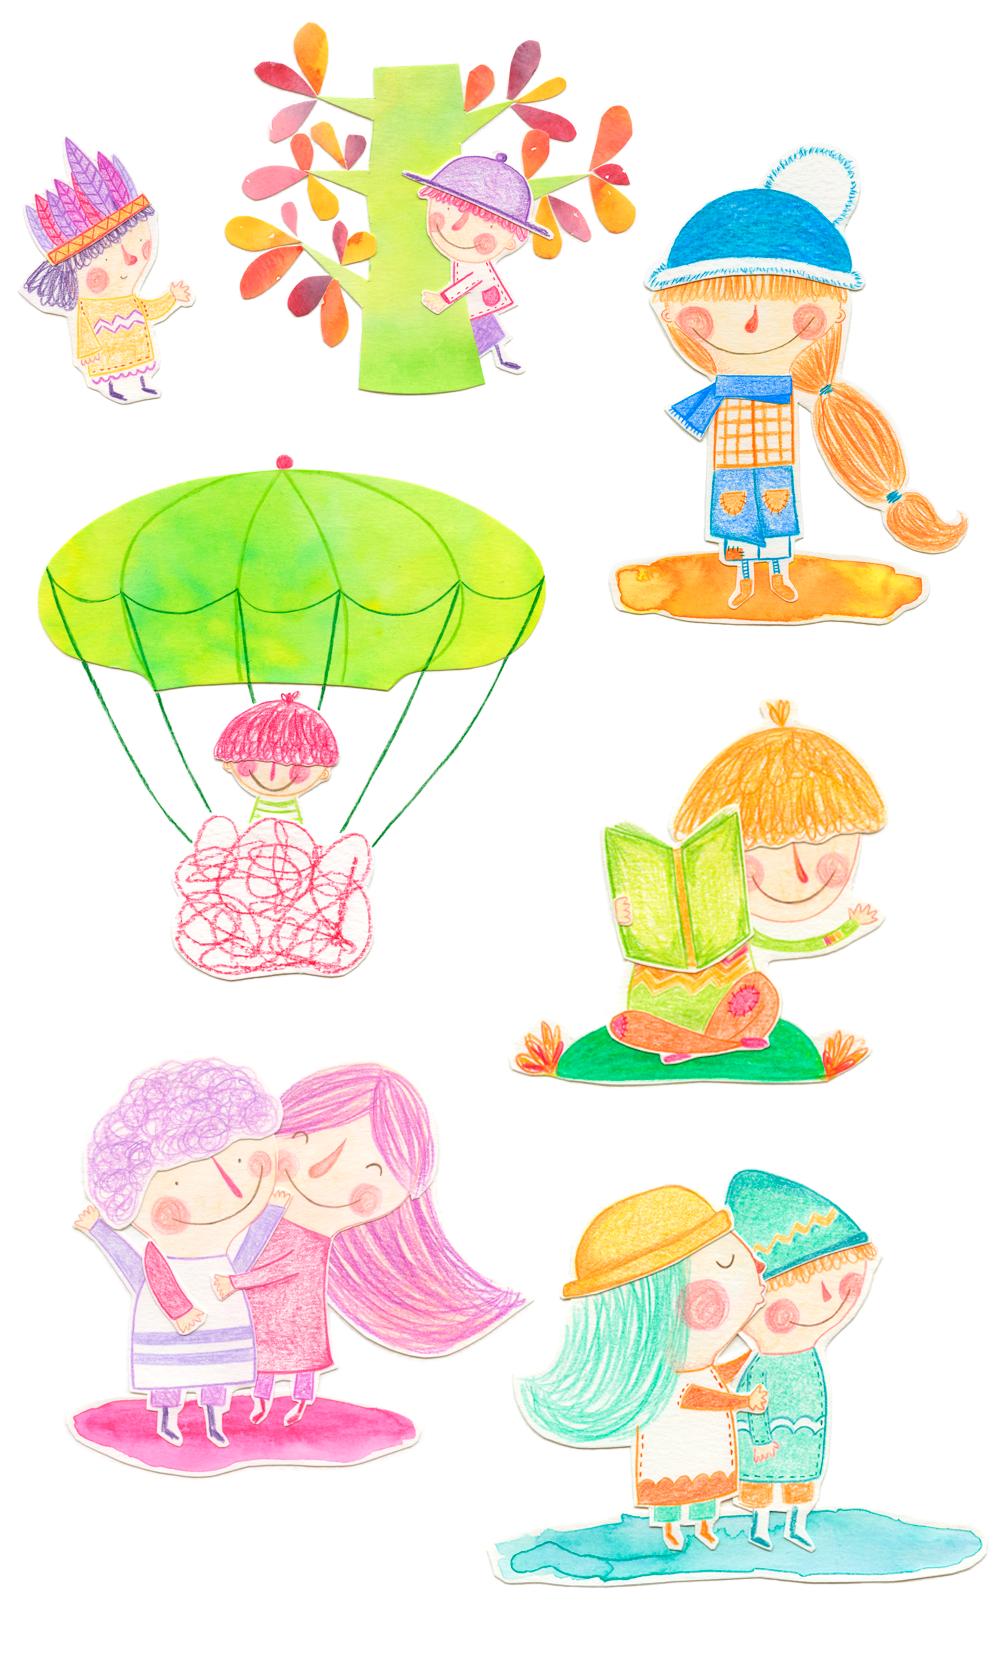 Ilustracion personal - Happiness characters - Raquel Bonita